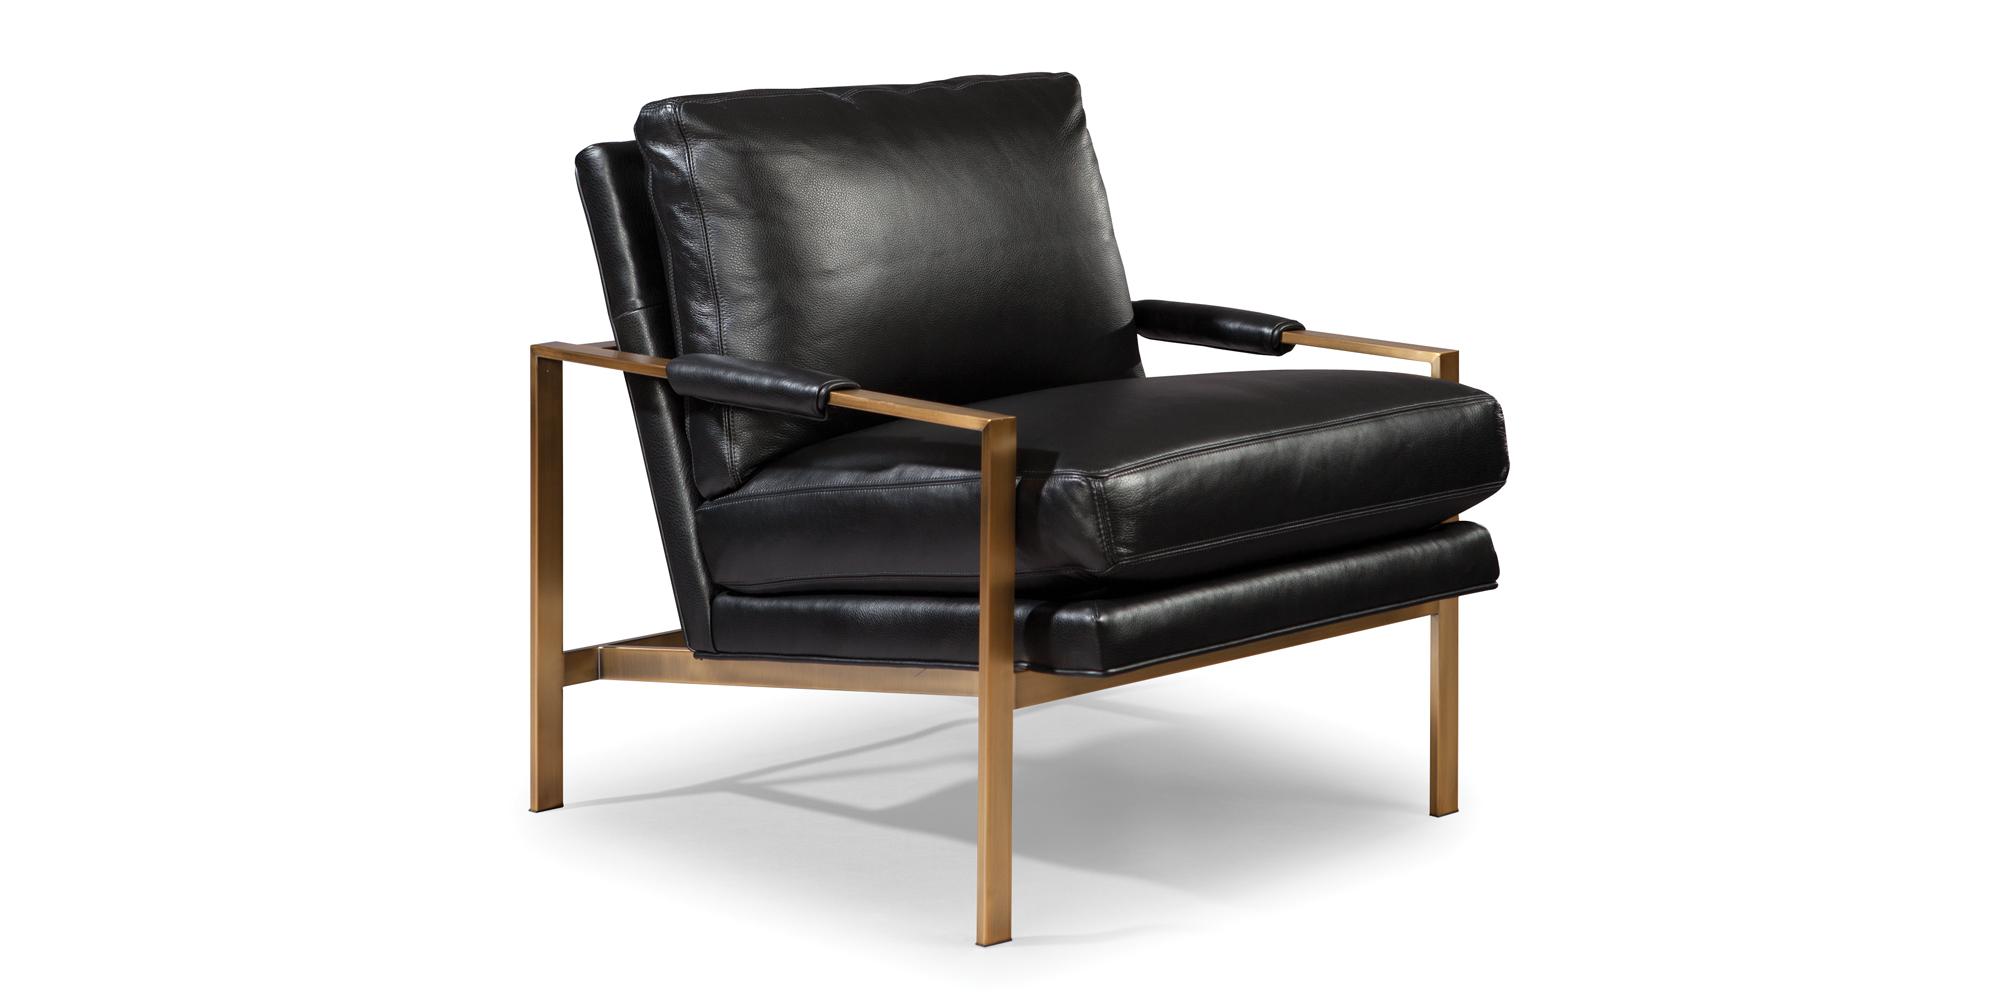 Thayer Coggin U2013 Custom Modern Furniture Since 1953